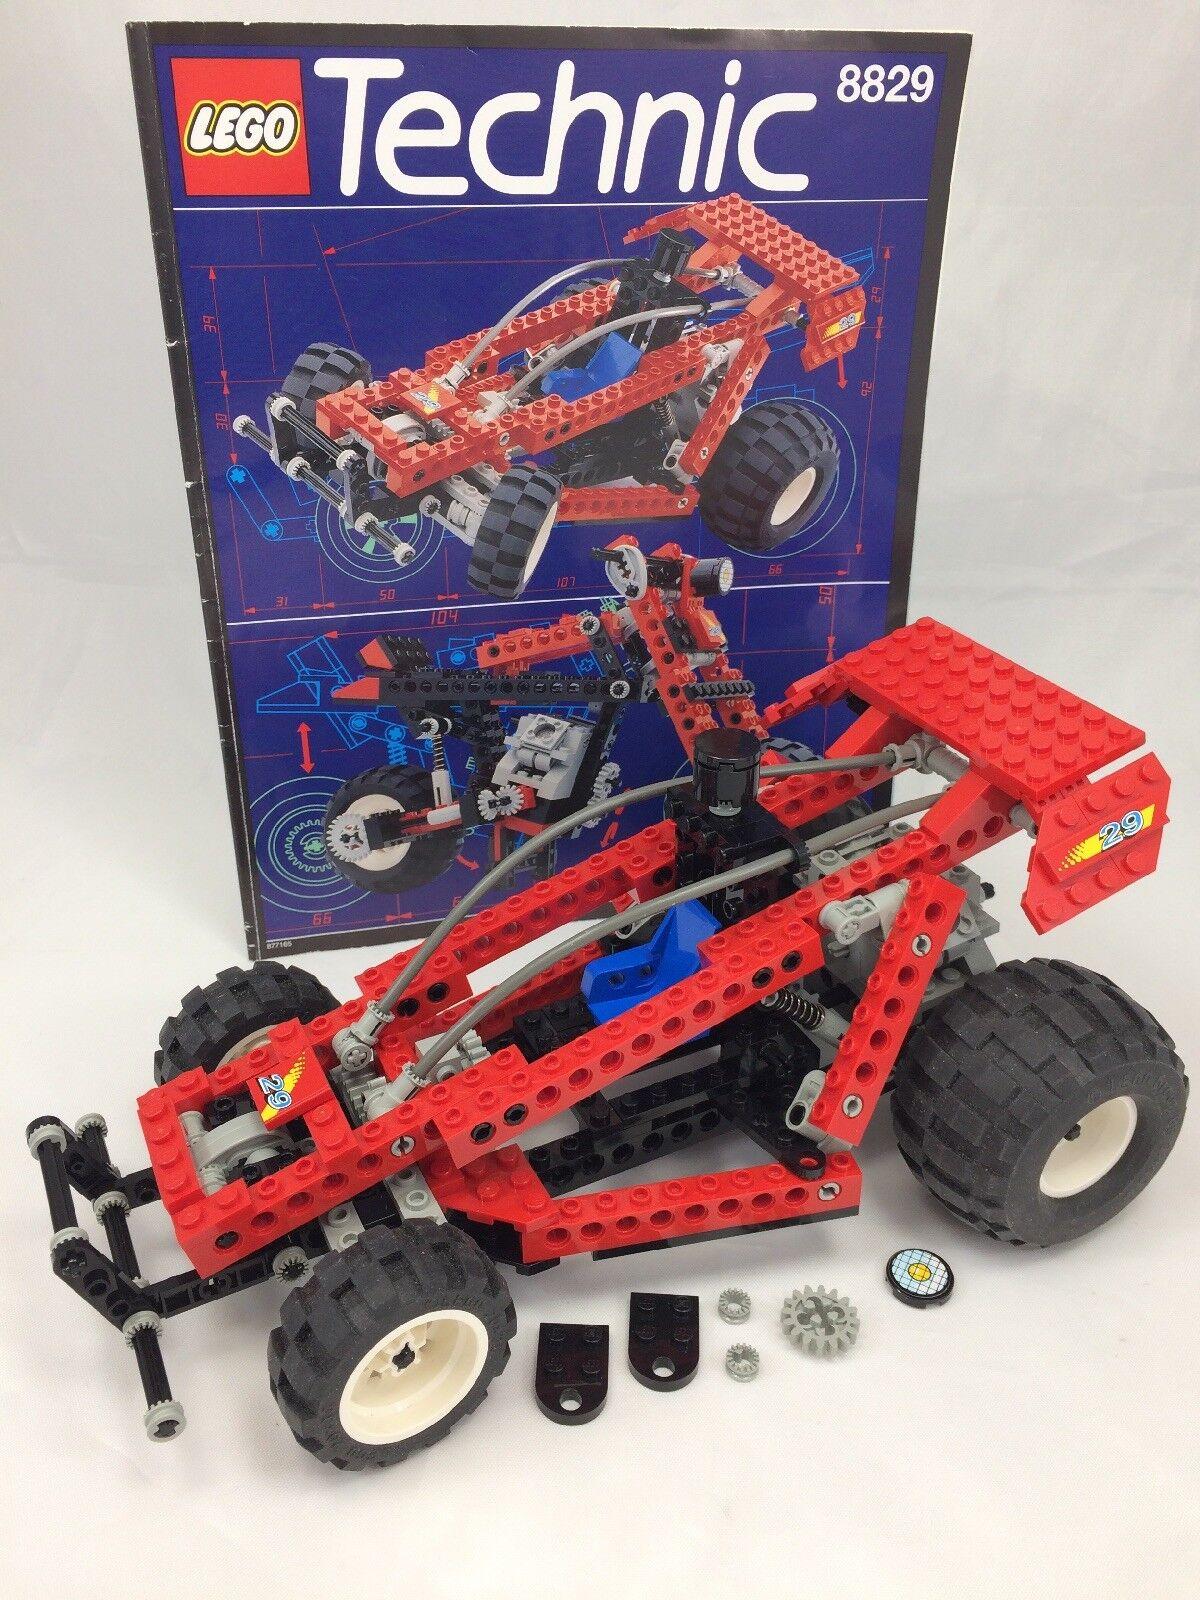 marca LEGO TECHNIC 8829 Dune Blaster     Motorbike - completare with Instructions  Nuova lista